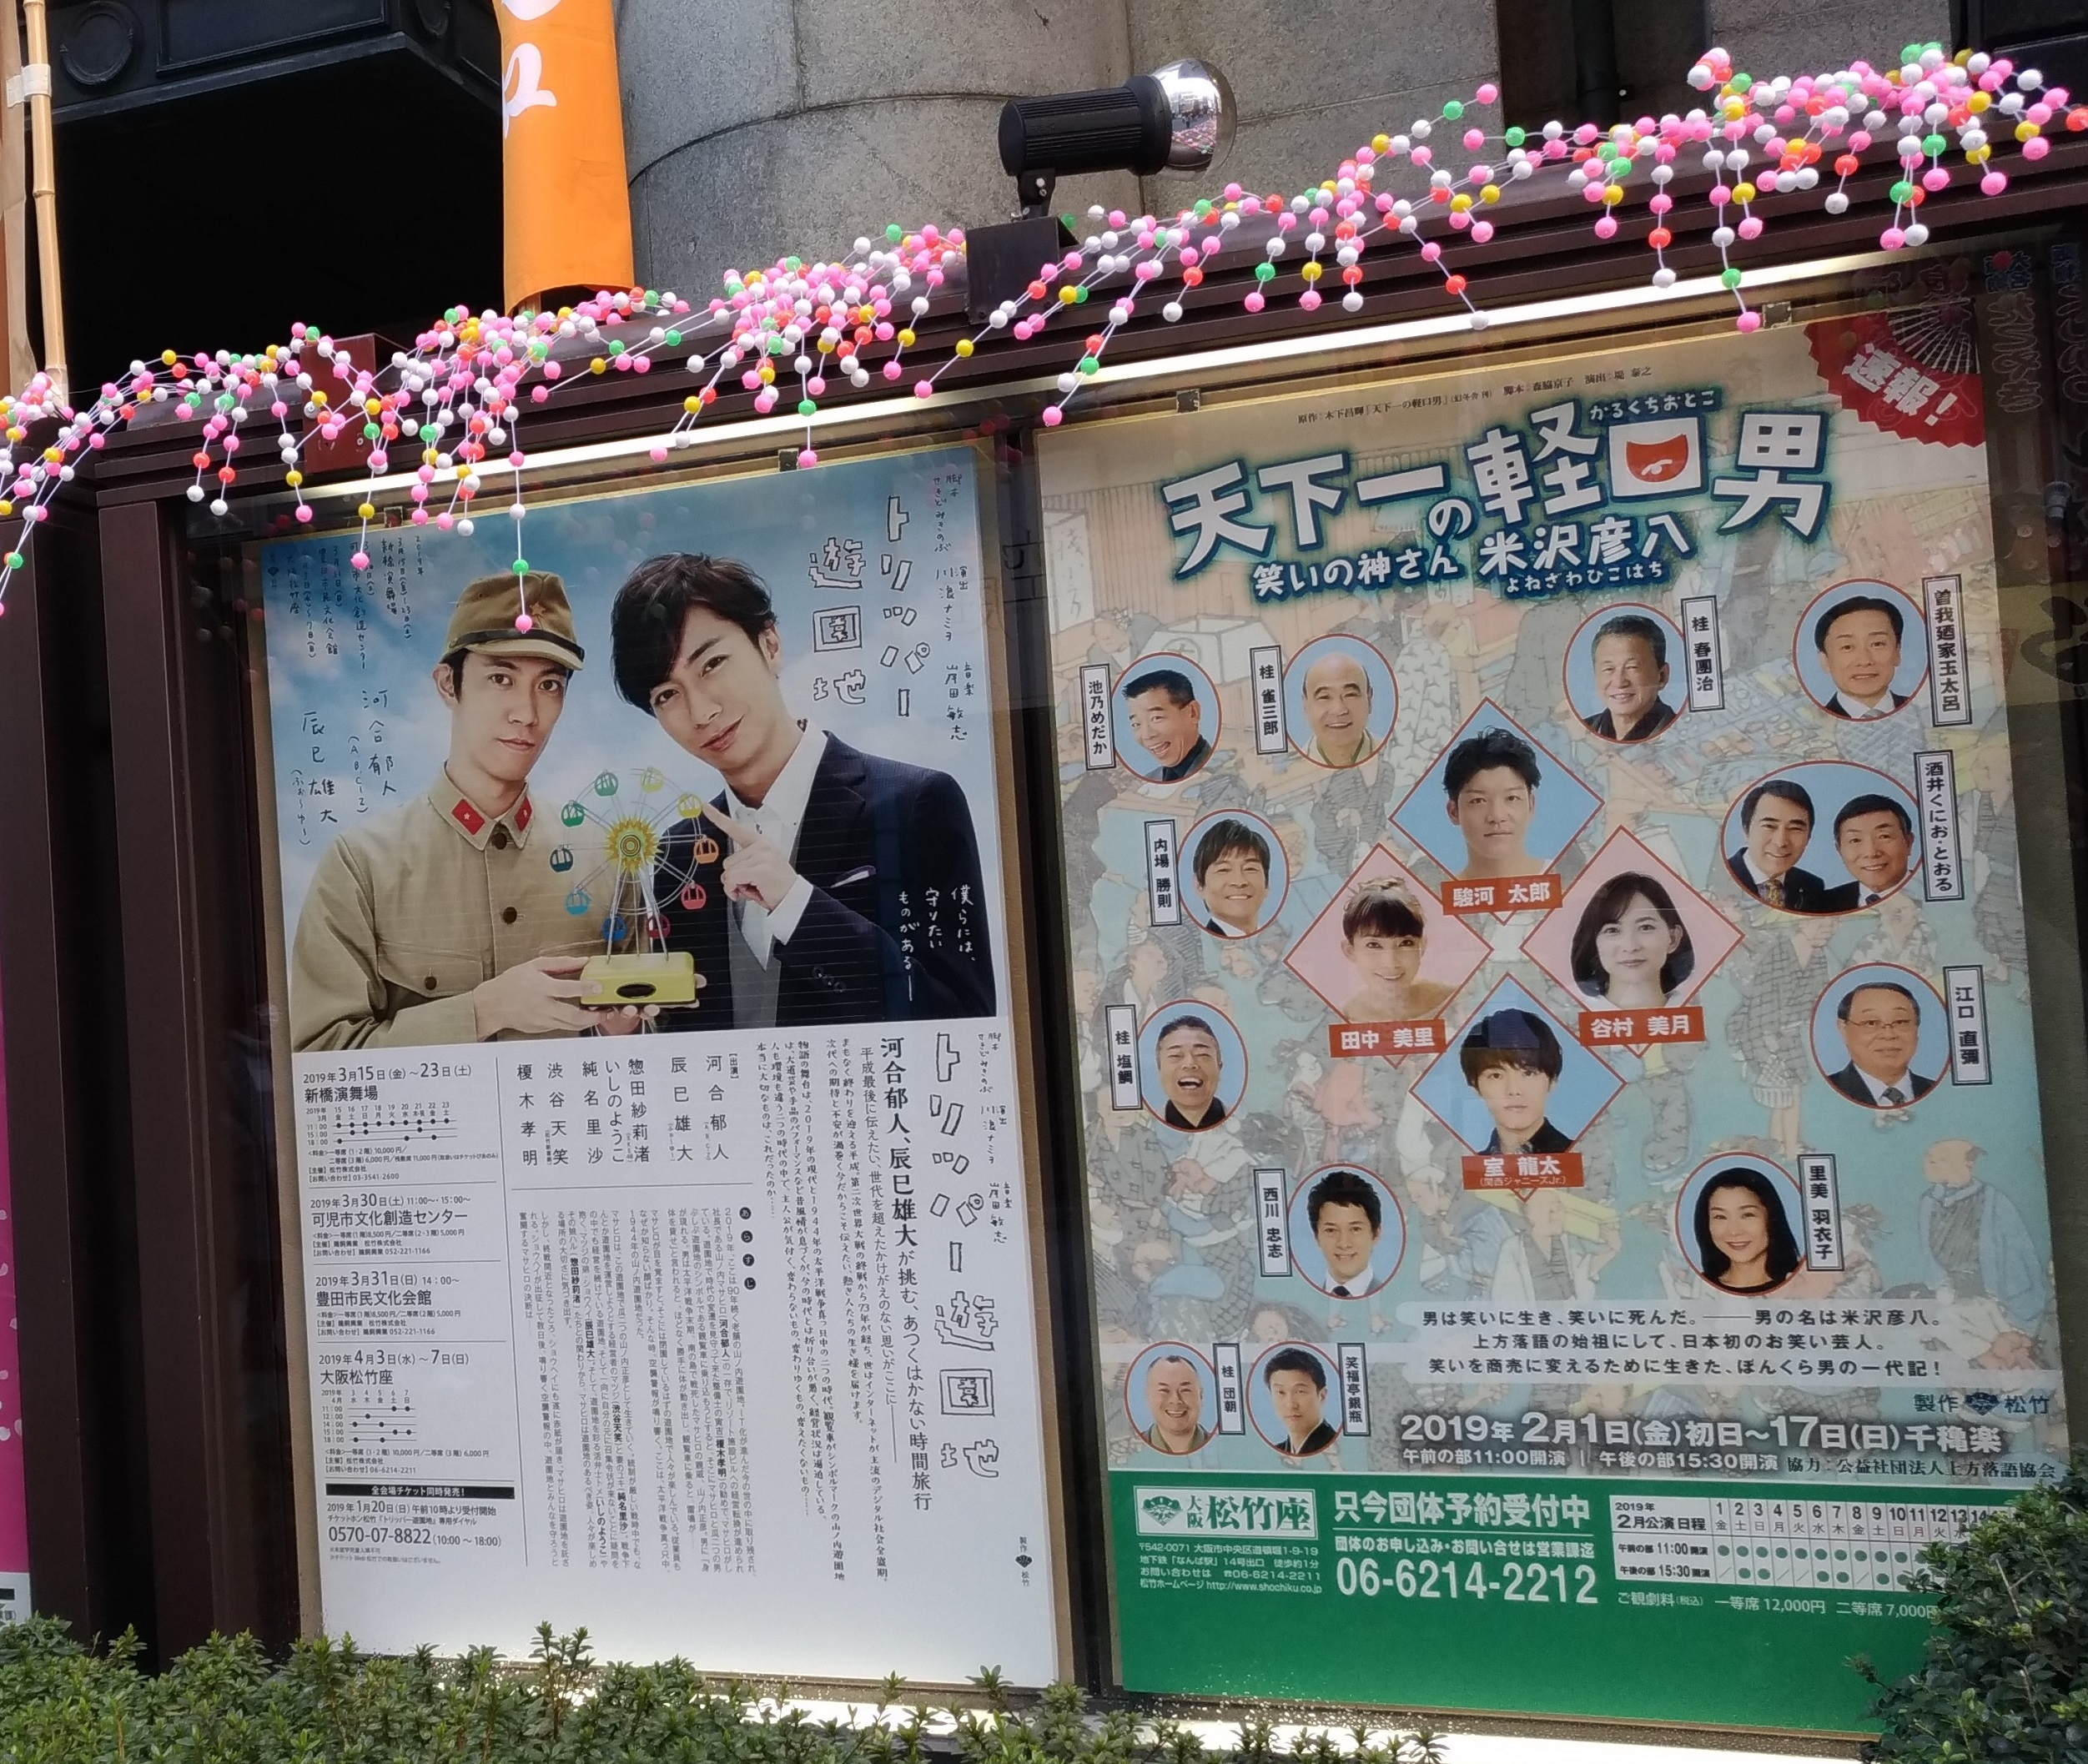 osaka_shochiku_butai.jpg